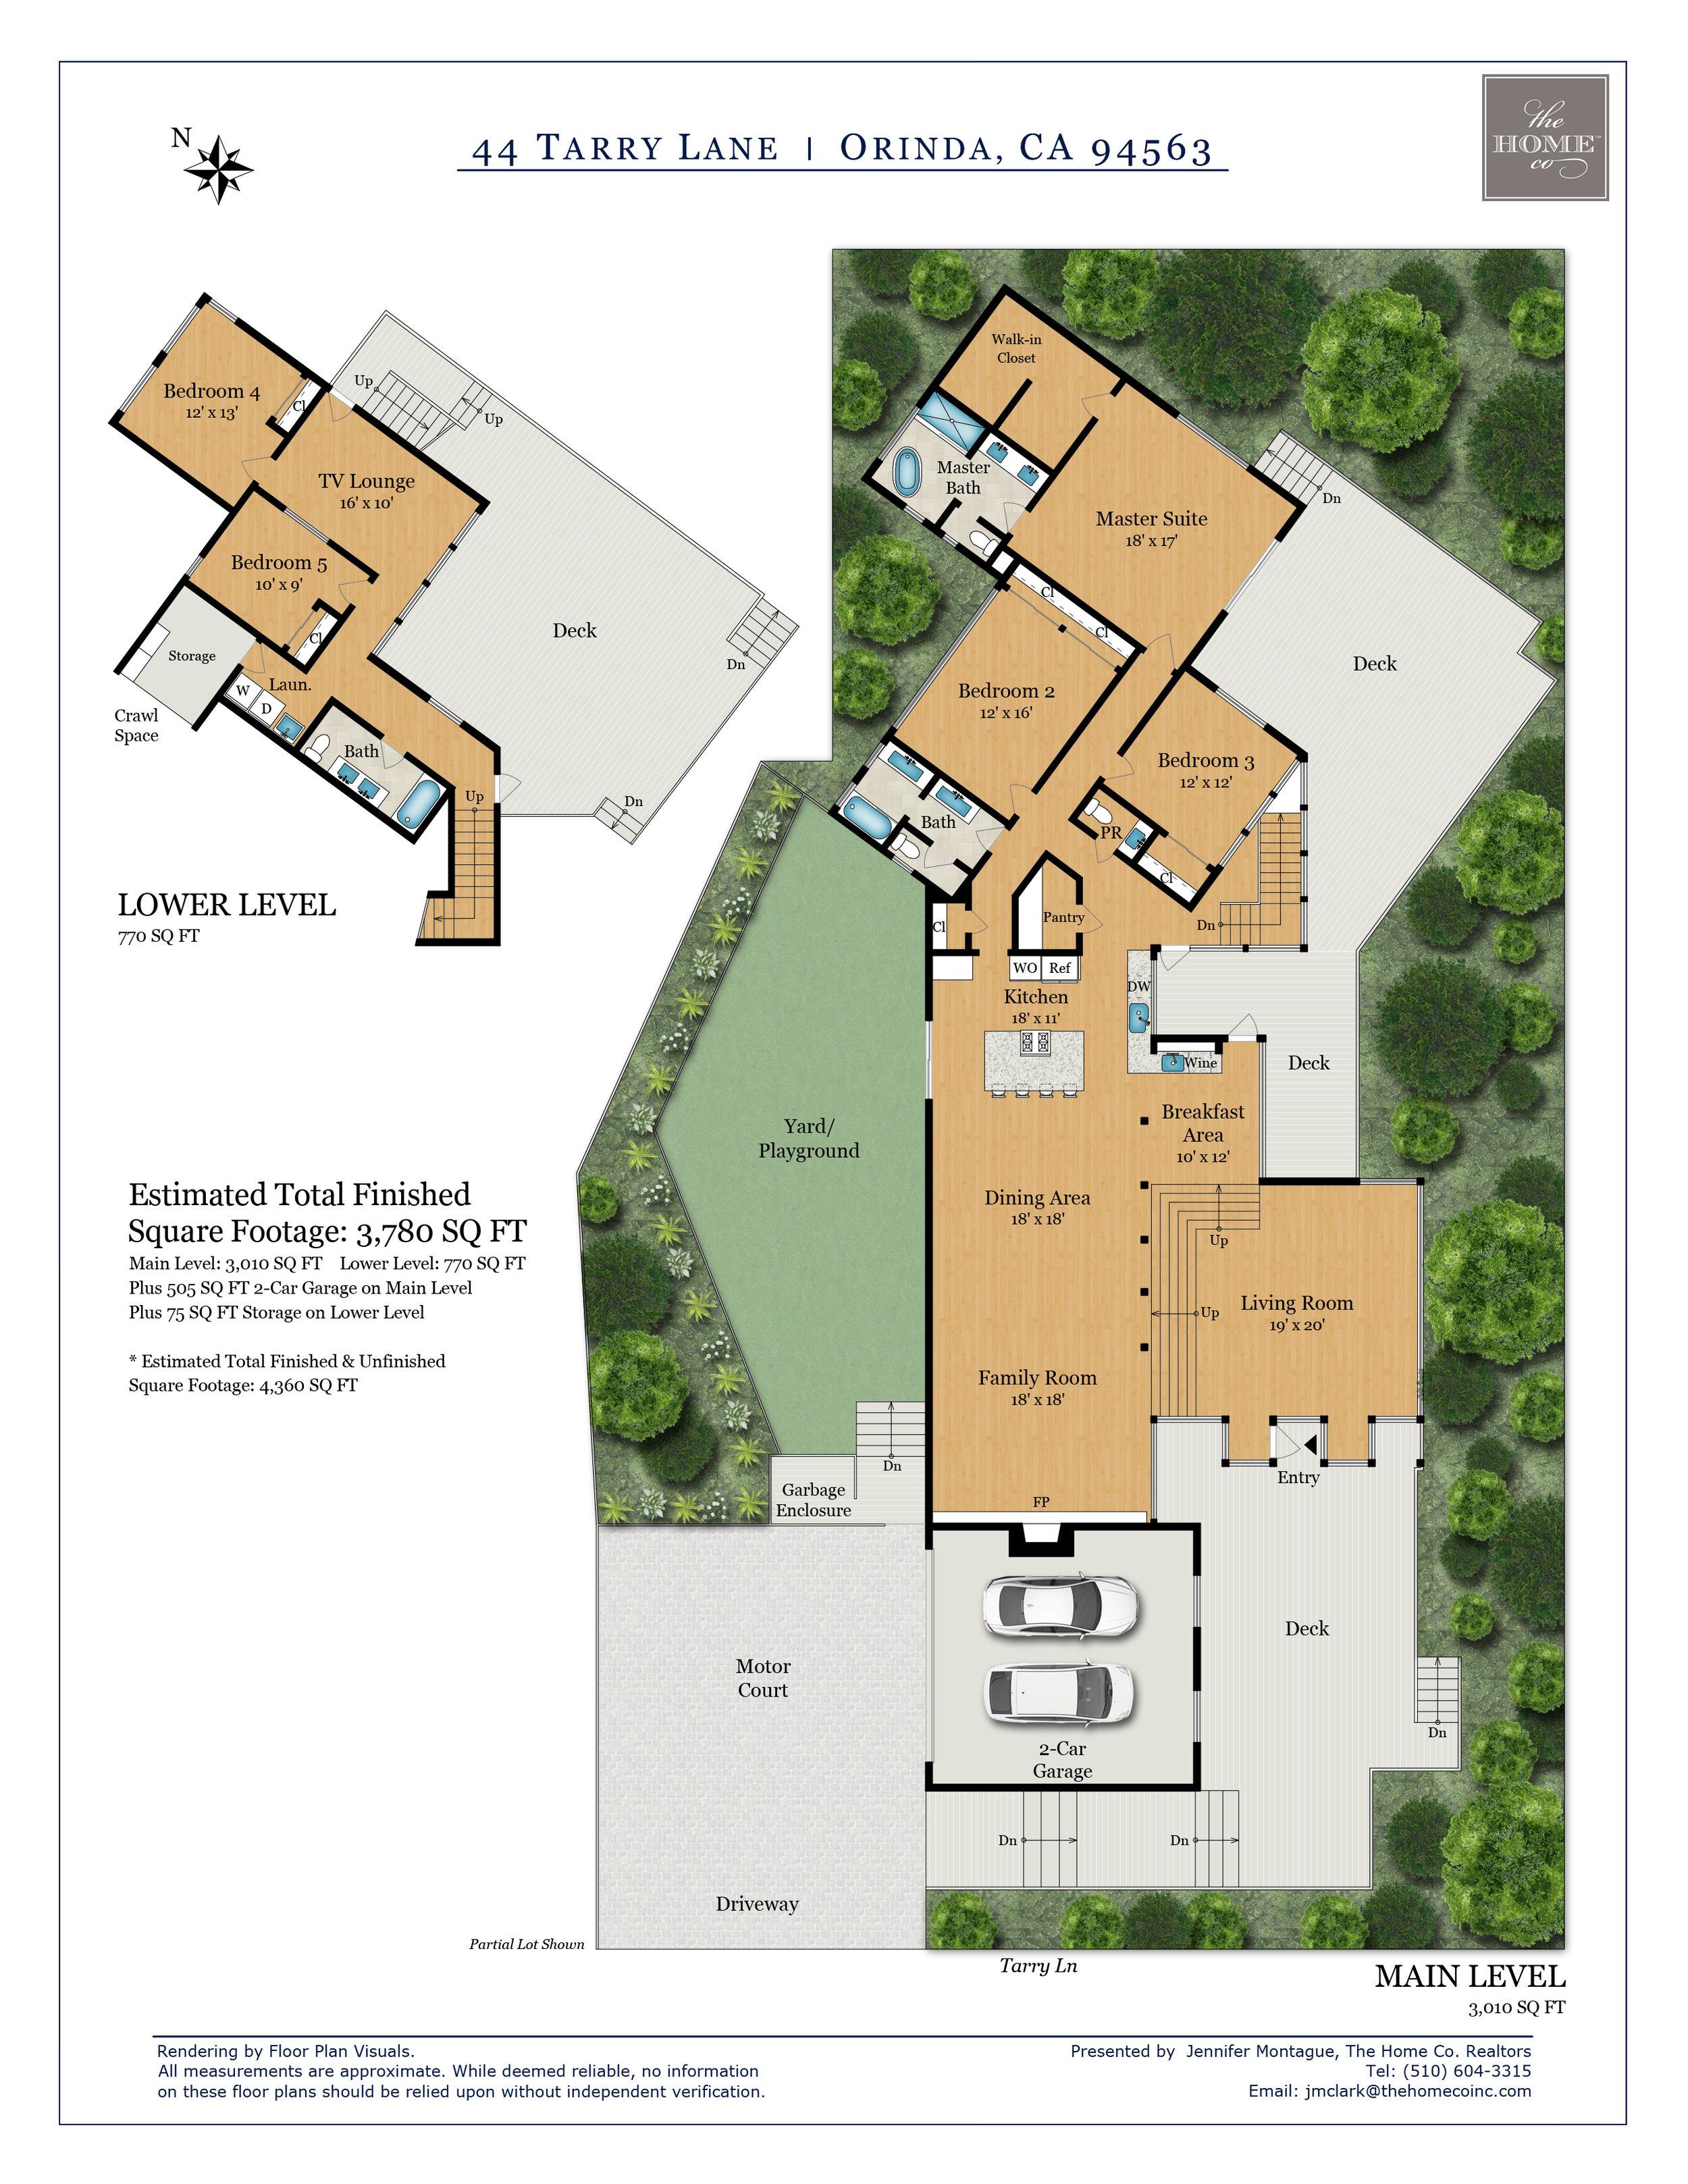 44 Tarry Lane Orinda Floor Plan